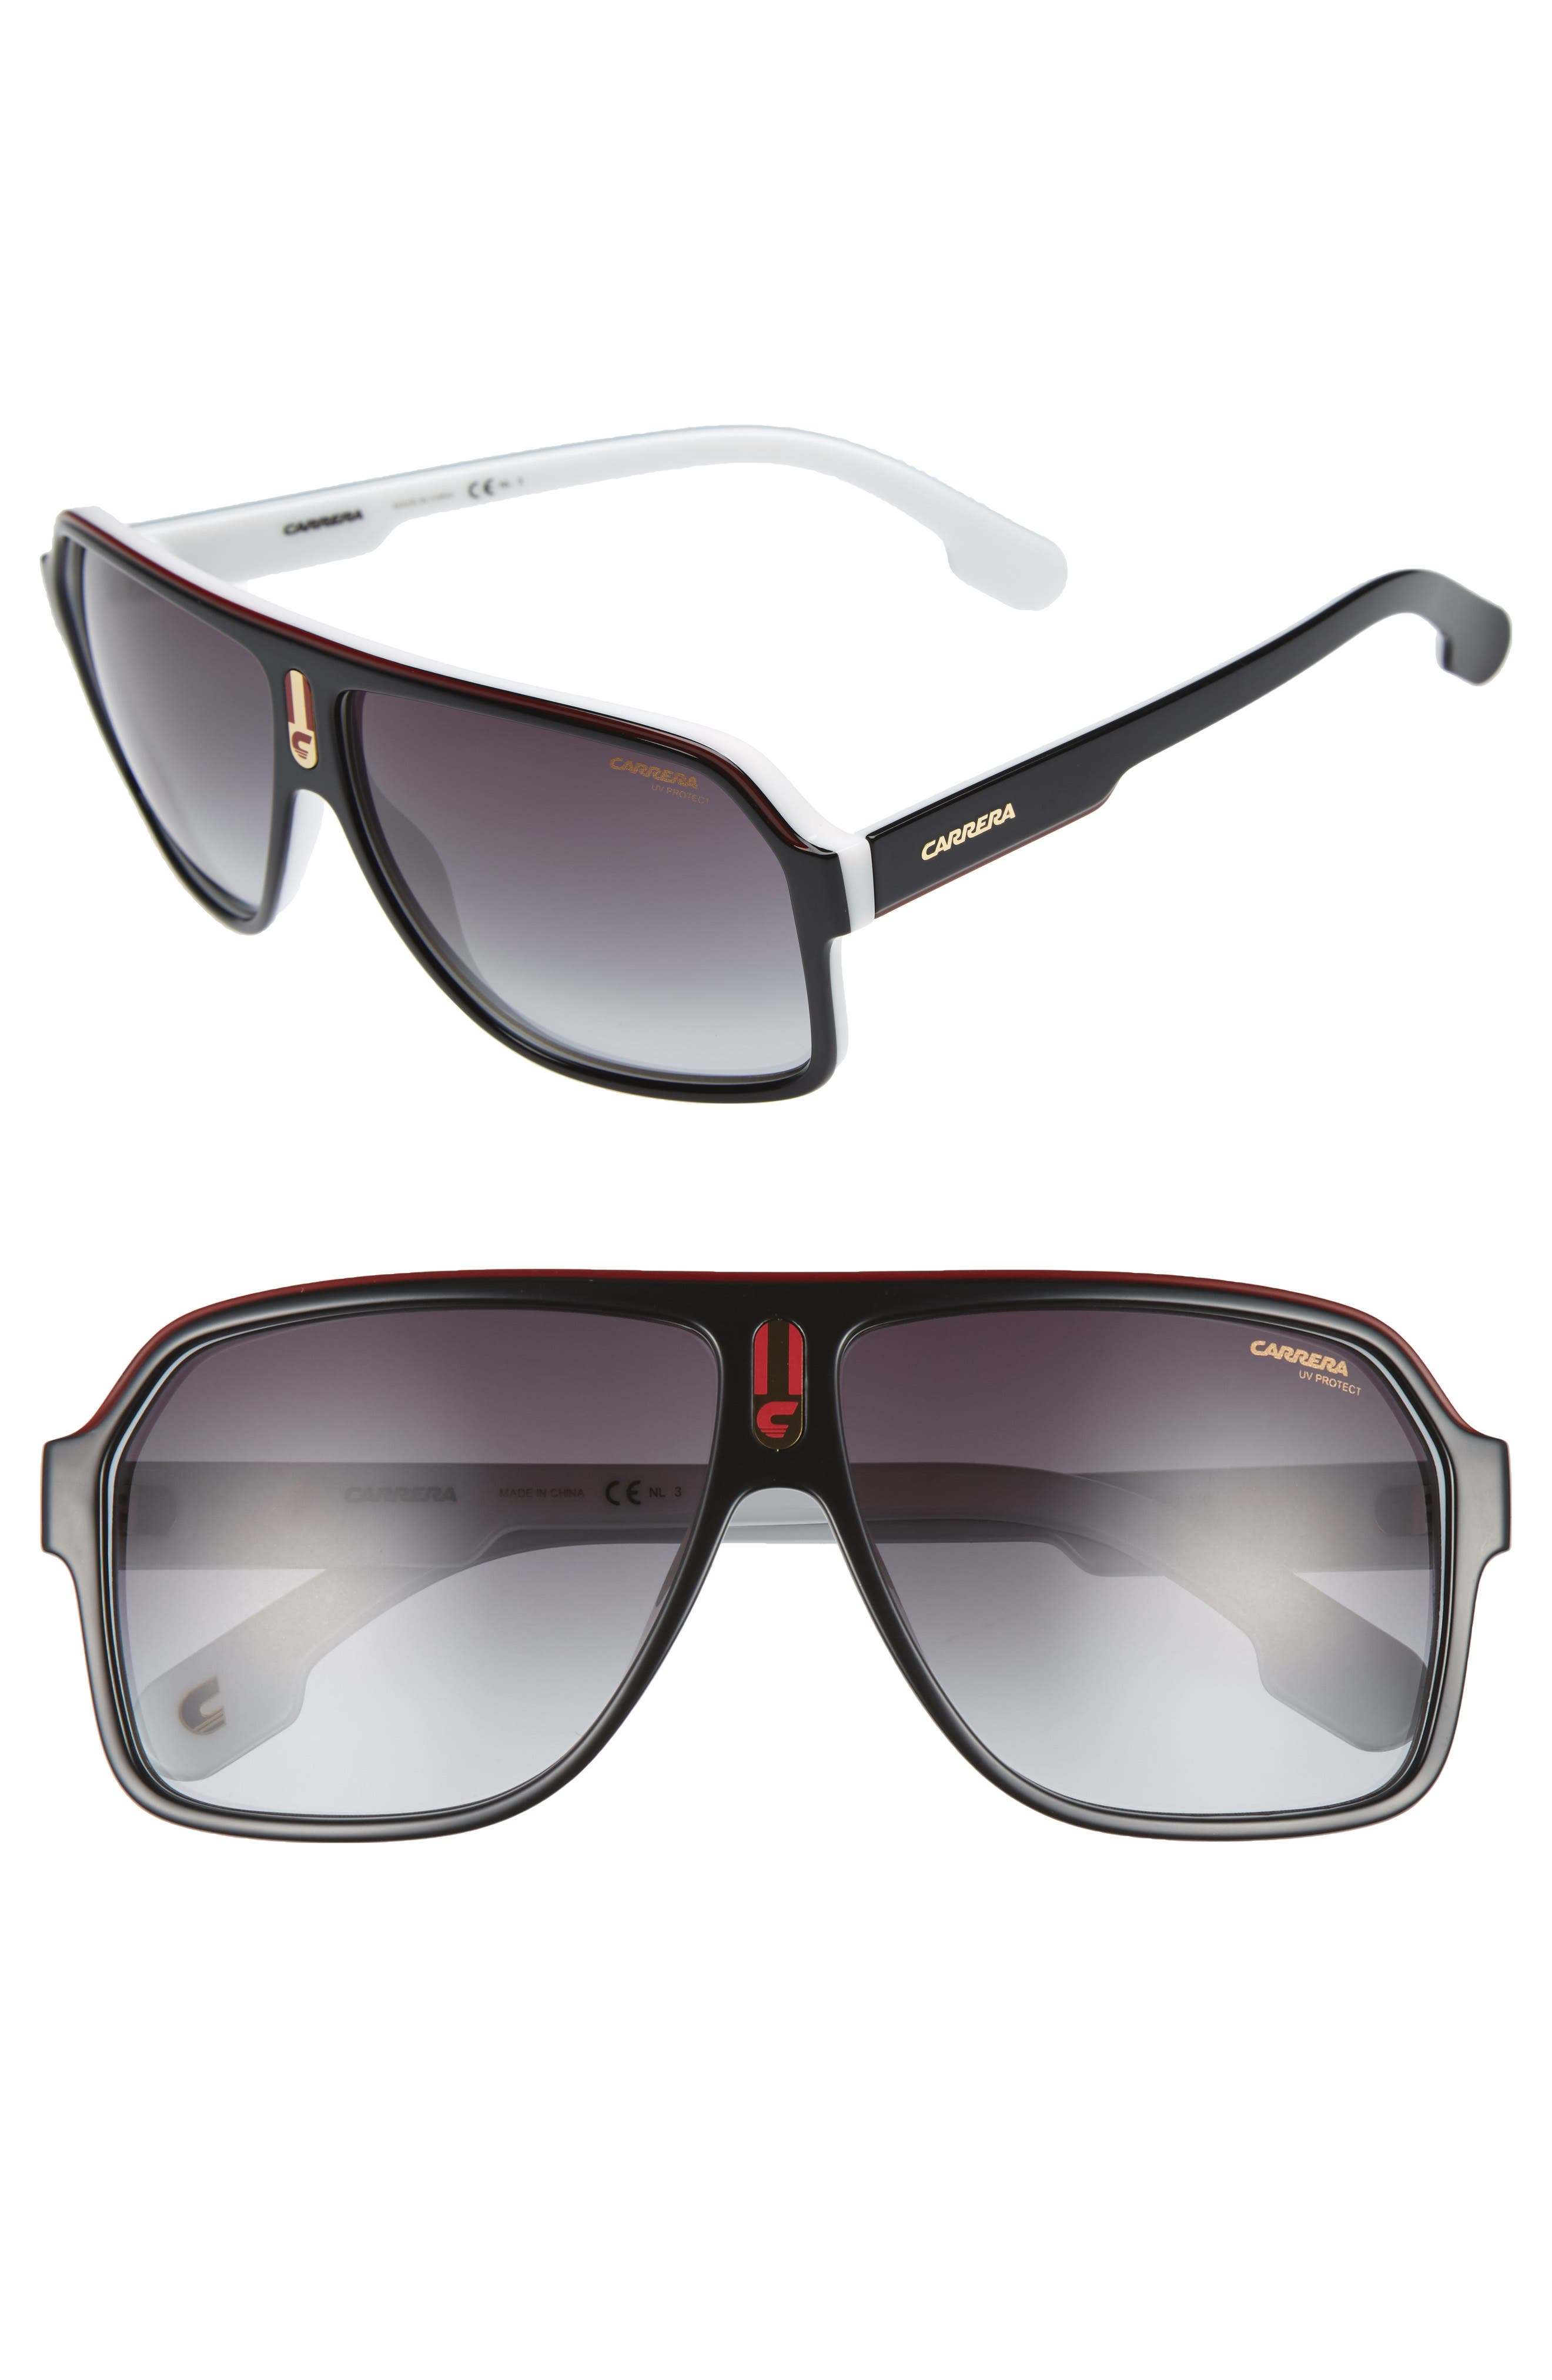 Main Image - Carrera Eyewear 1001/S 62mm Sunglasses